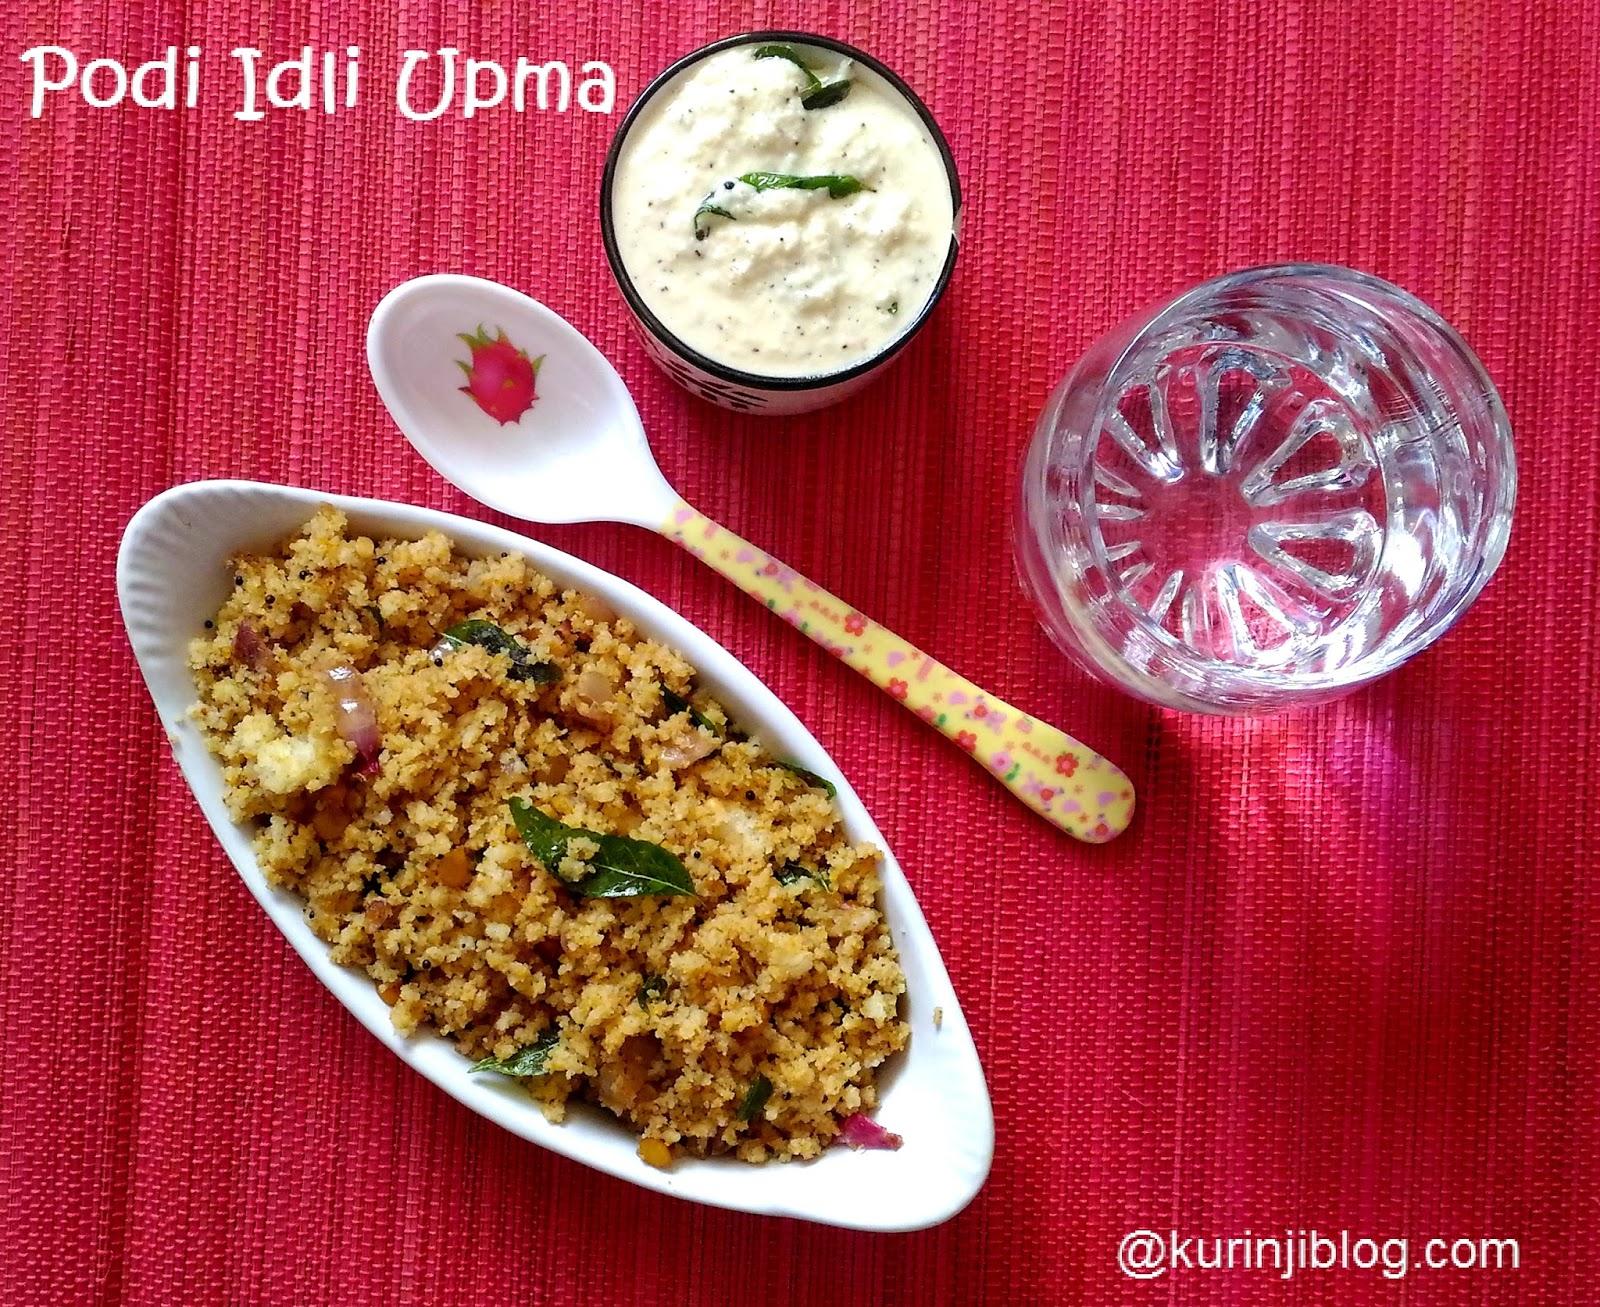 Idli upma recipe idli upma with leftover idli how to make idli upma